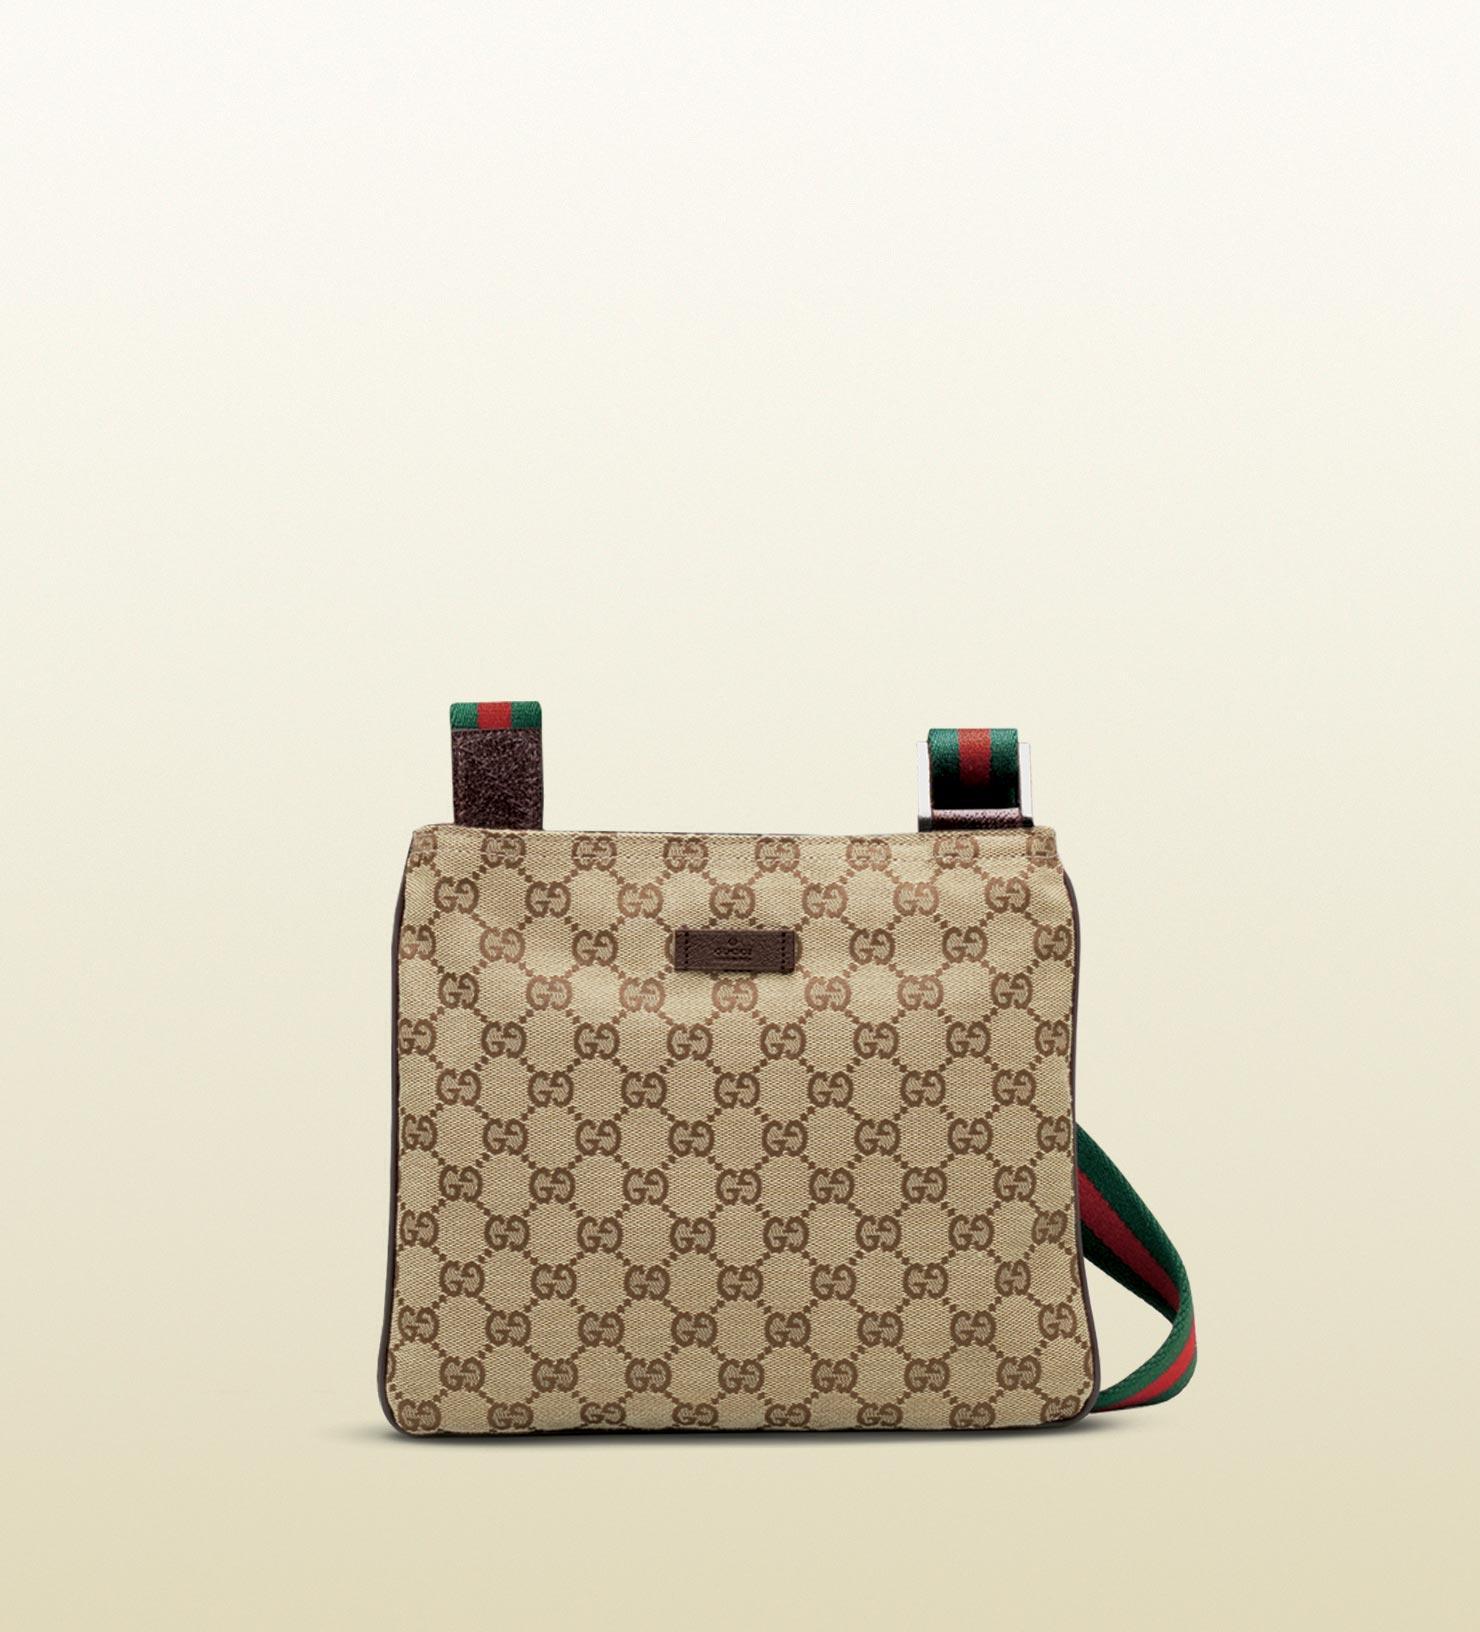 d2e04193d37 Lyst - Gucci Original Gg Canvas Messenger Bag in Natural for Men